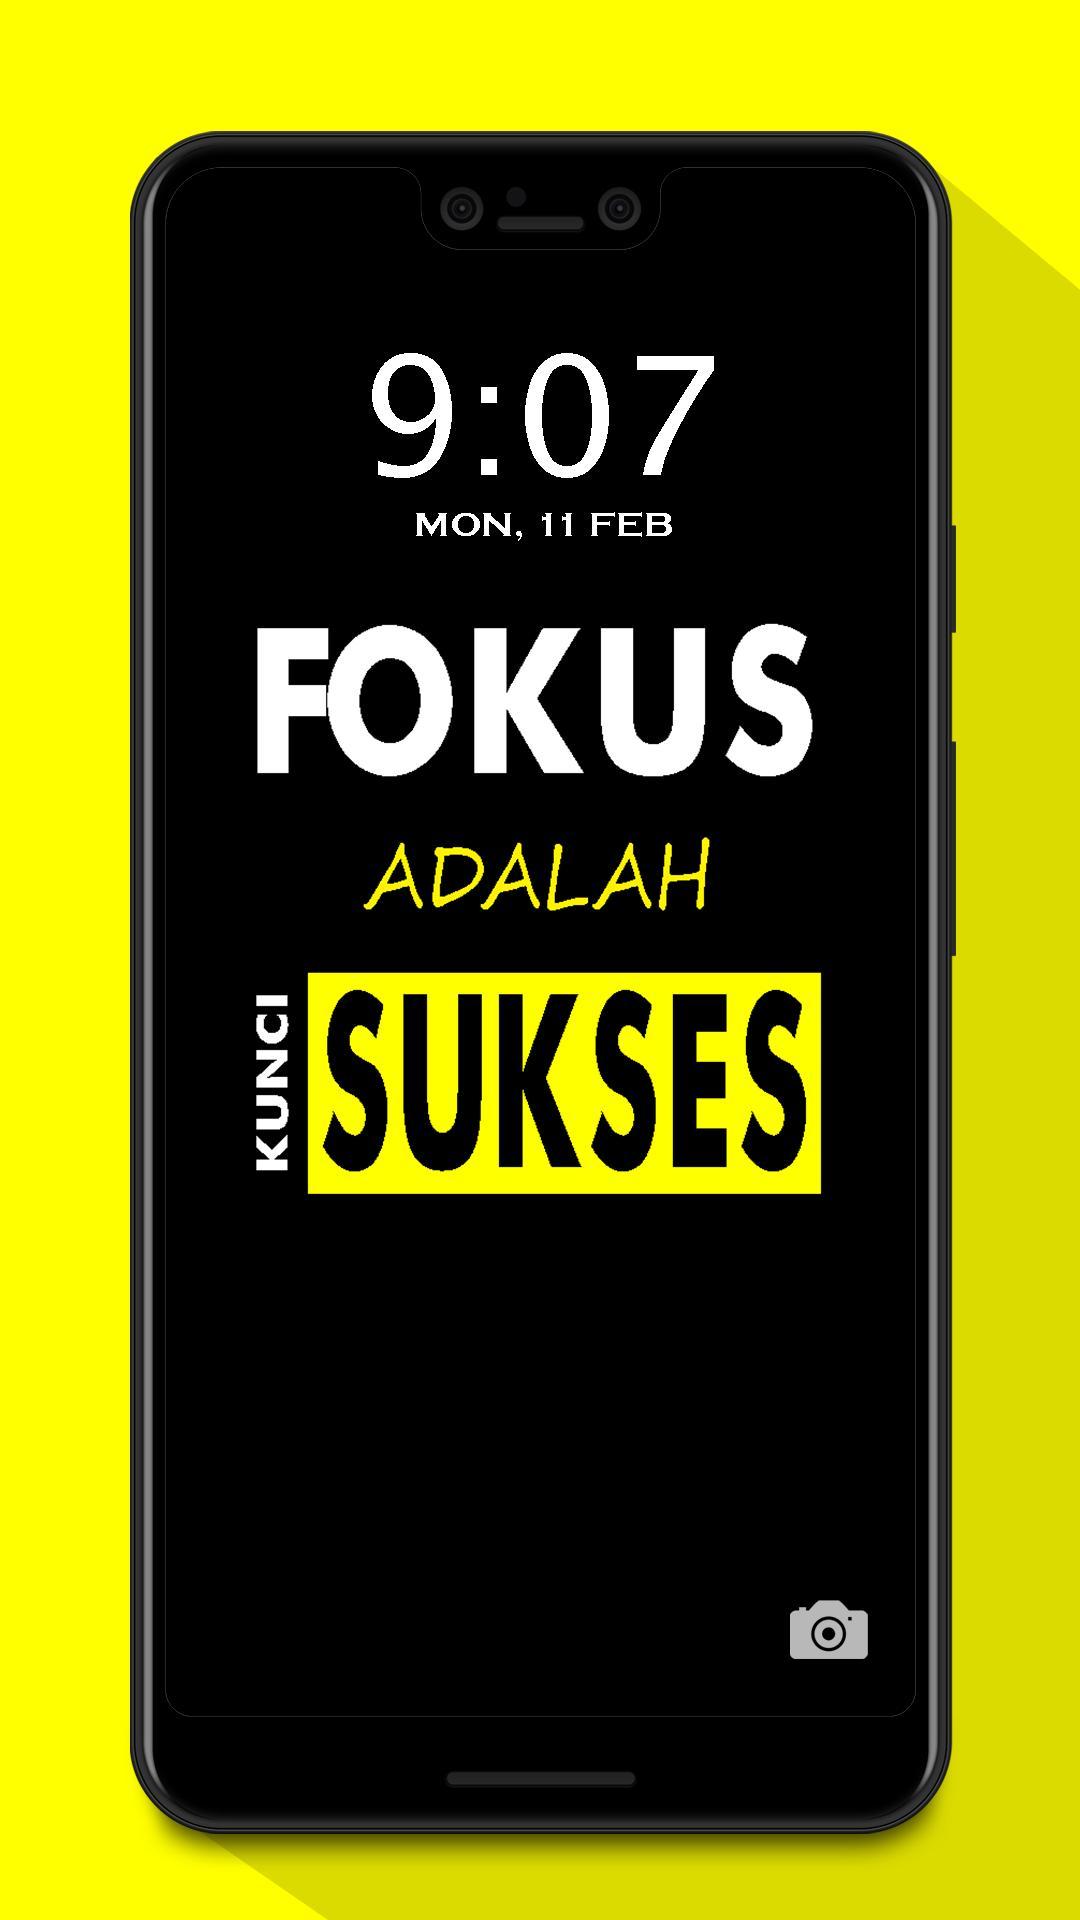 Quotes Kata Motivasi Wallpaper Hd For Android Apk Download